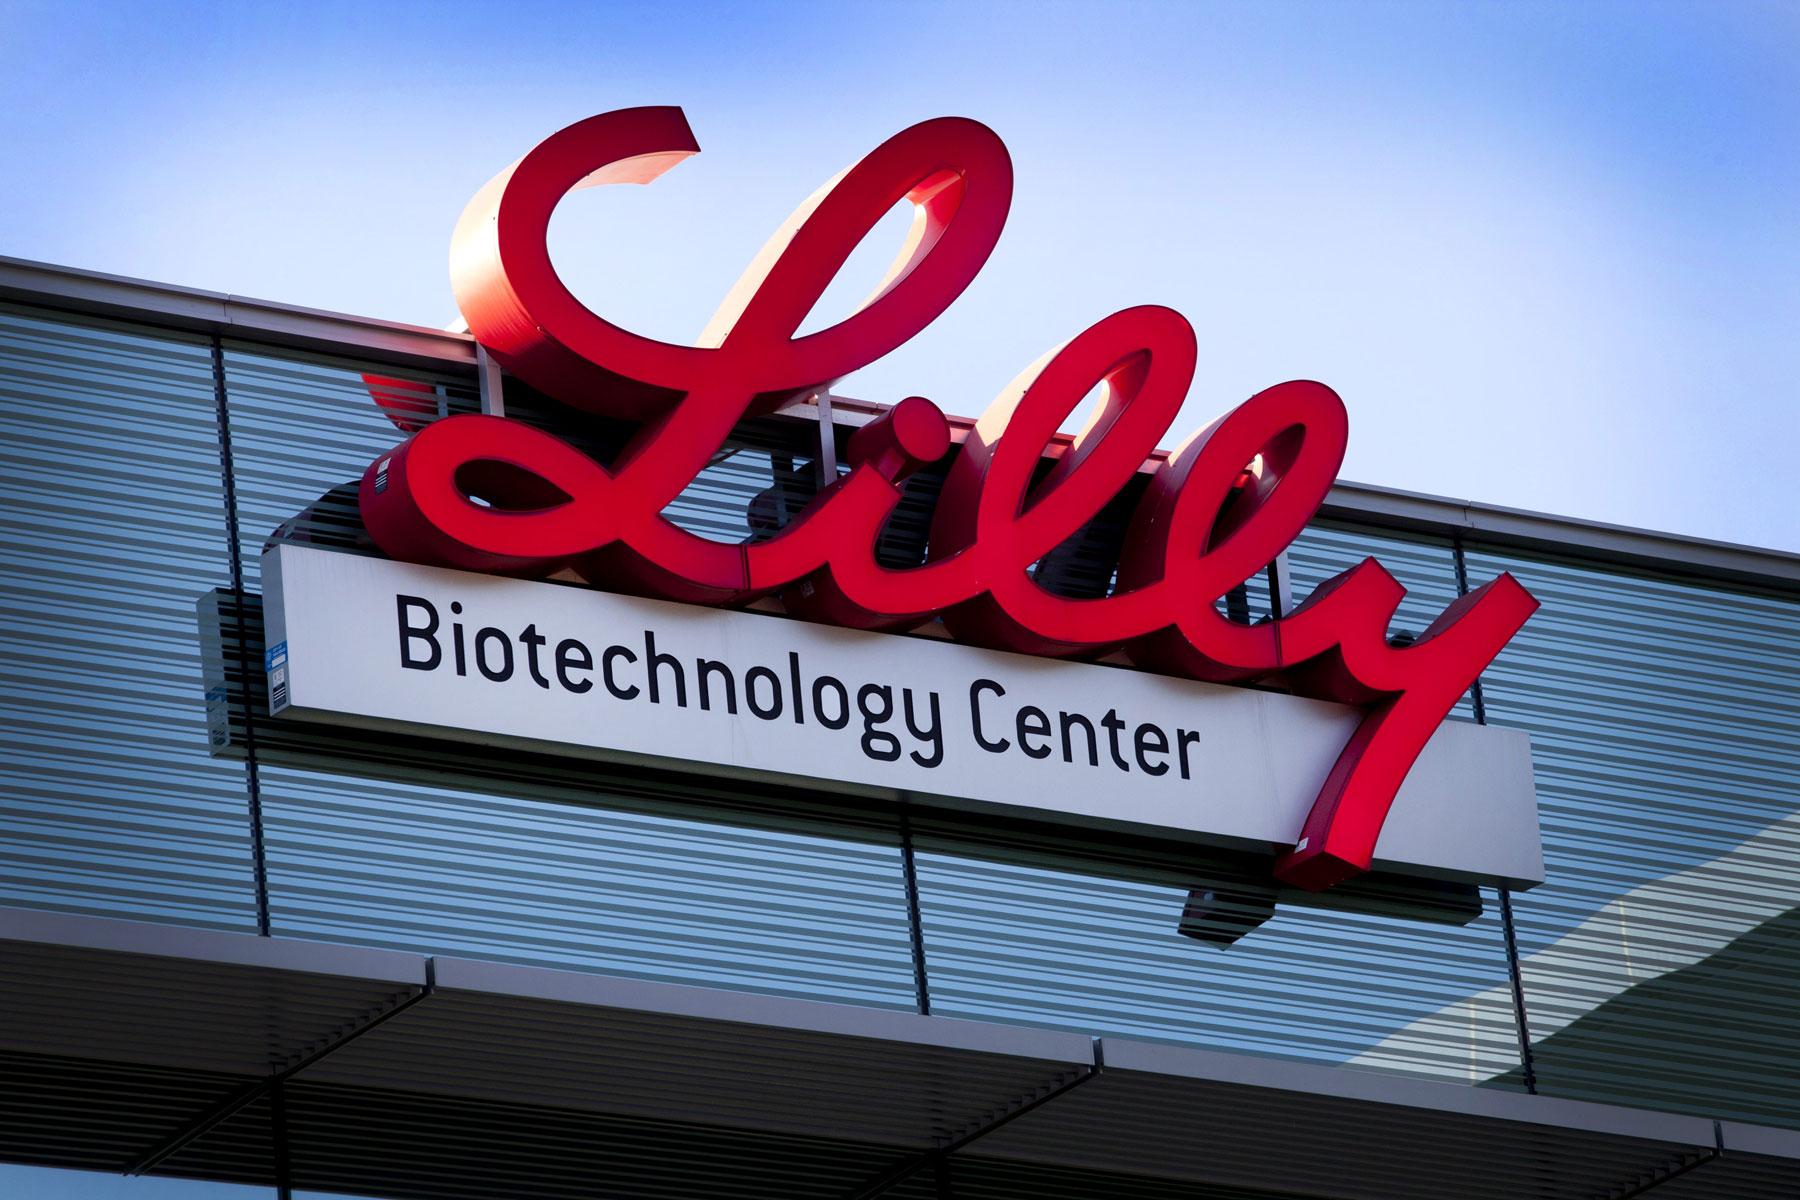 Eli Lilly вложит € 35 млн. в новое предприятие в Ирландии